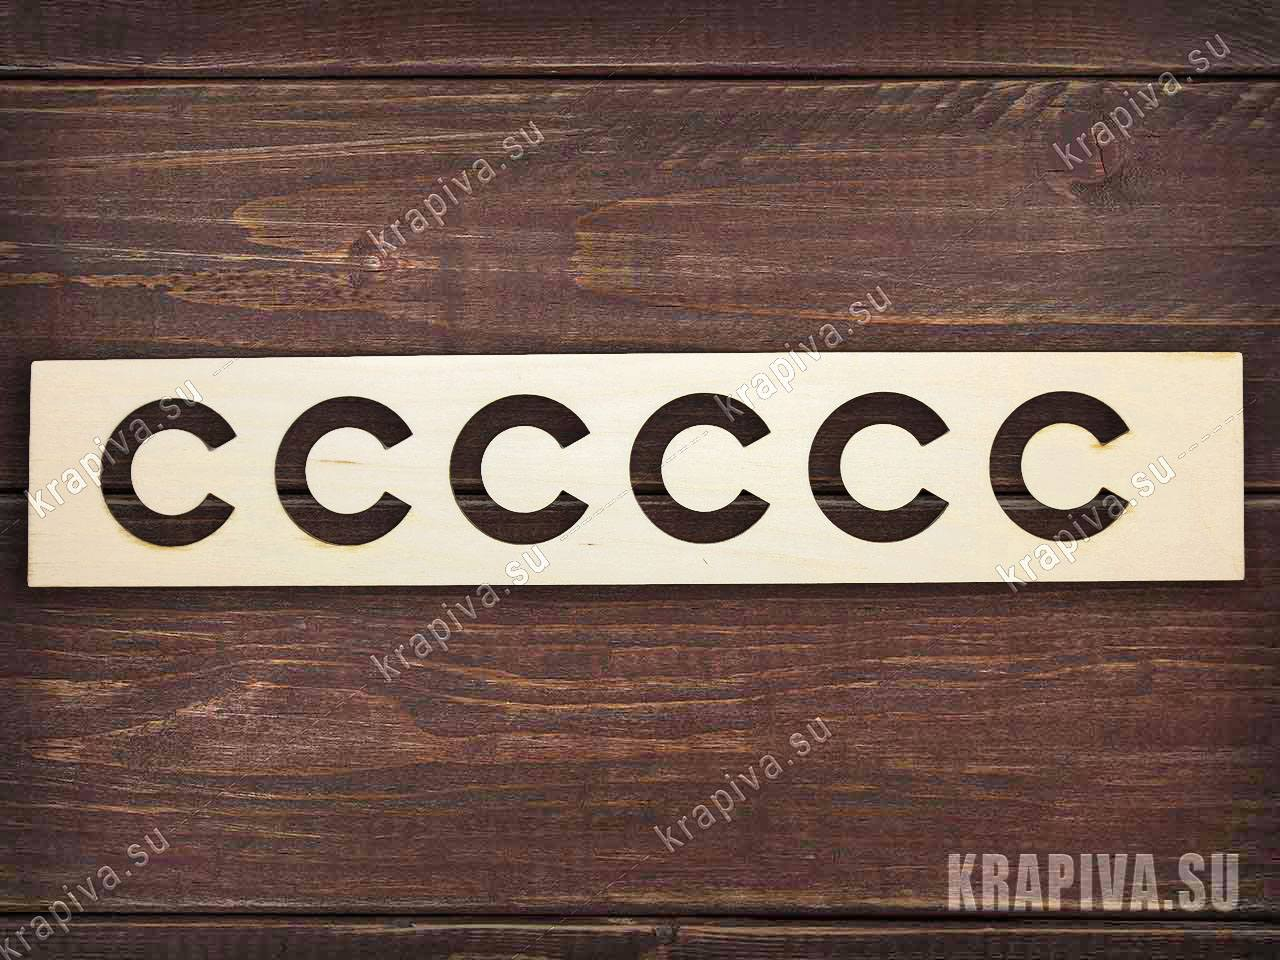 Развивающая линейка №6 за 46 руб. в магазине Крапива (krapiva.su) (фото)